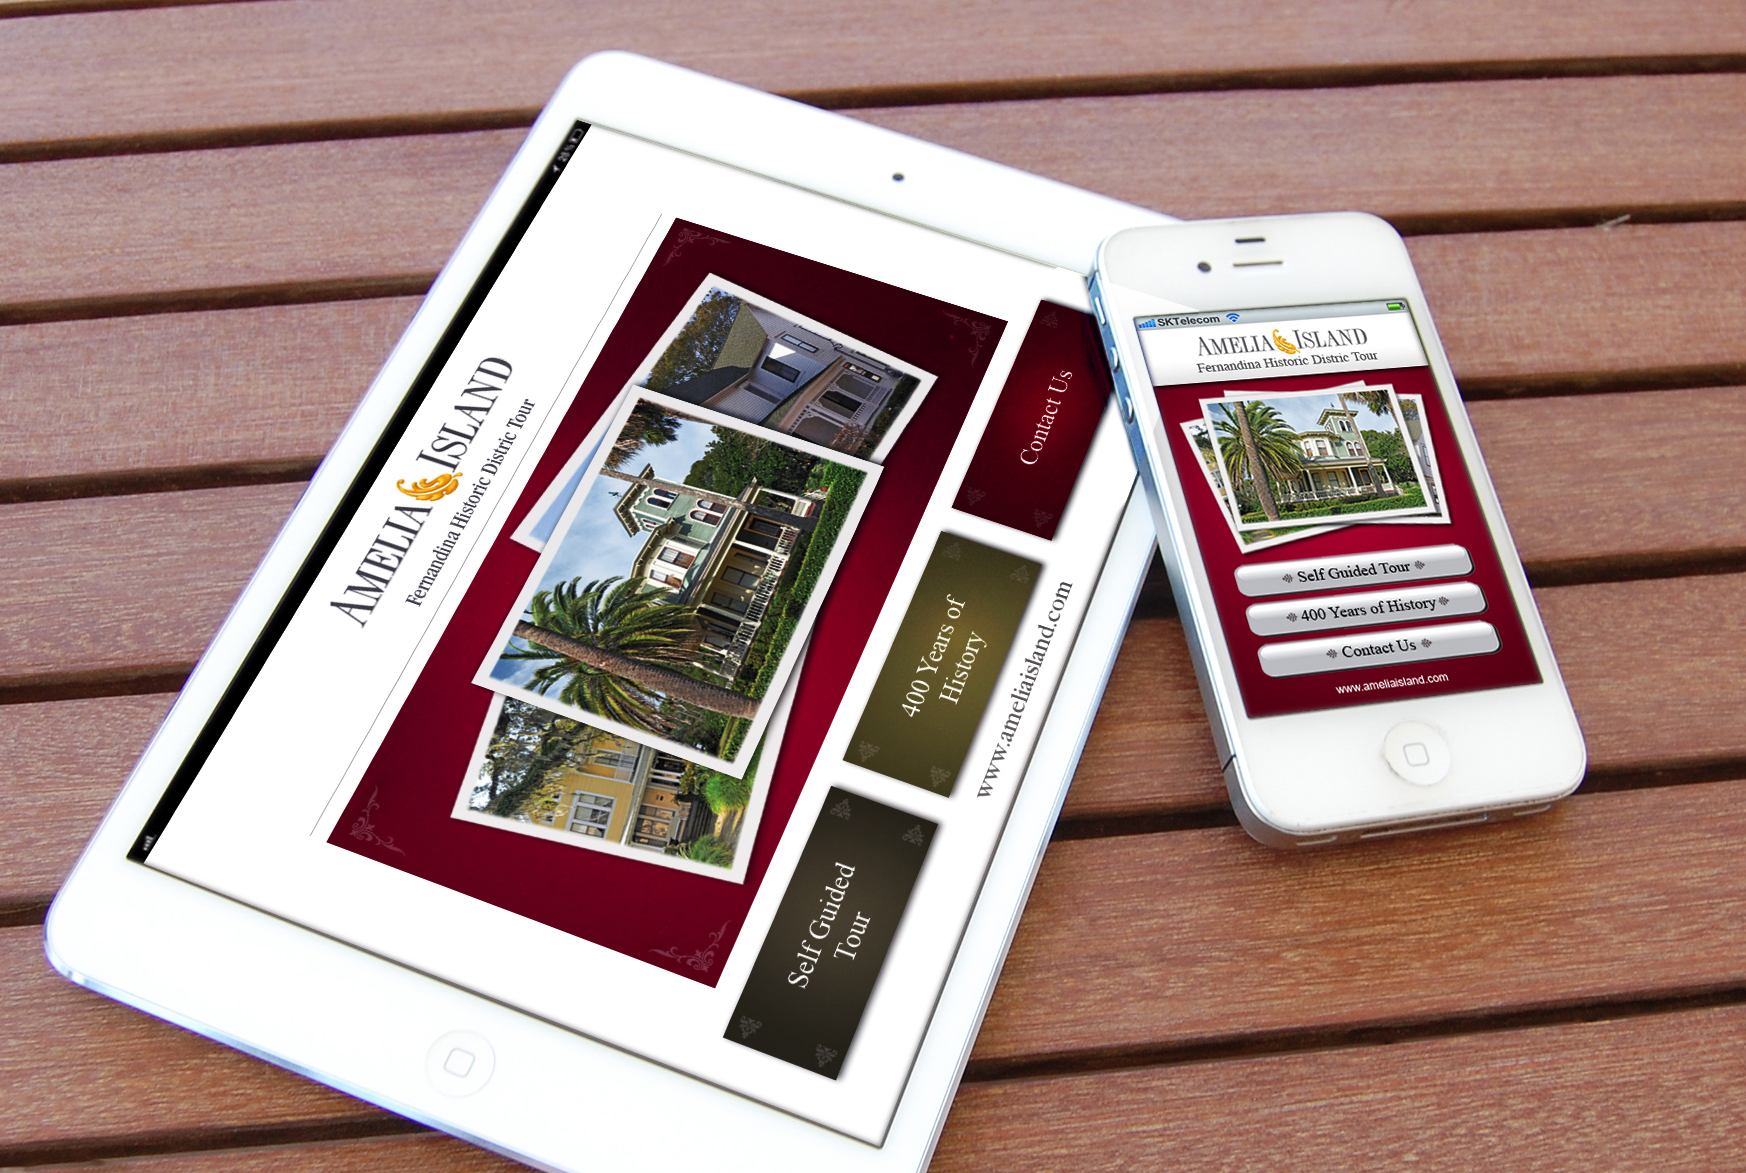 AmeliaIsland_iPad_iPhone_crop